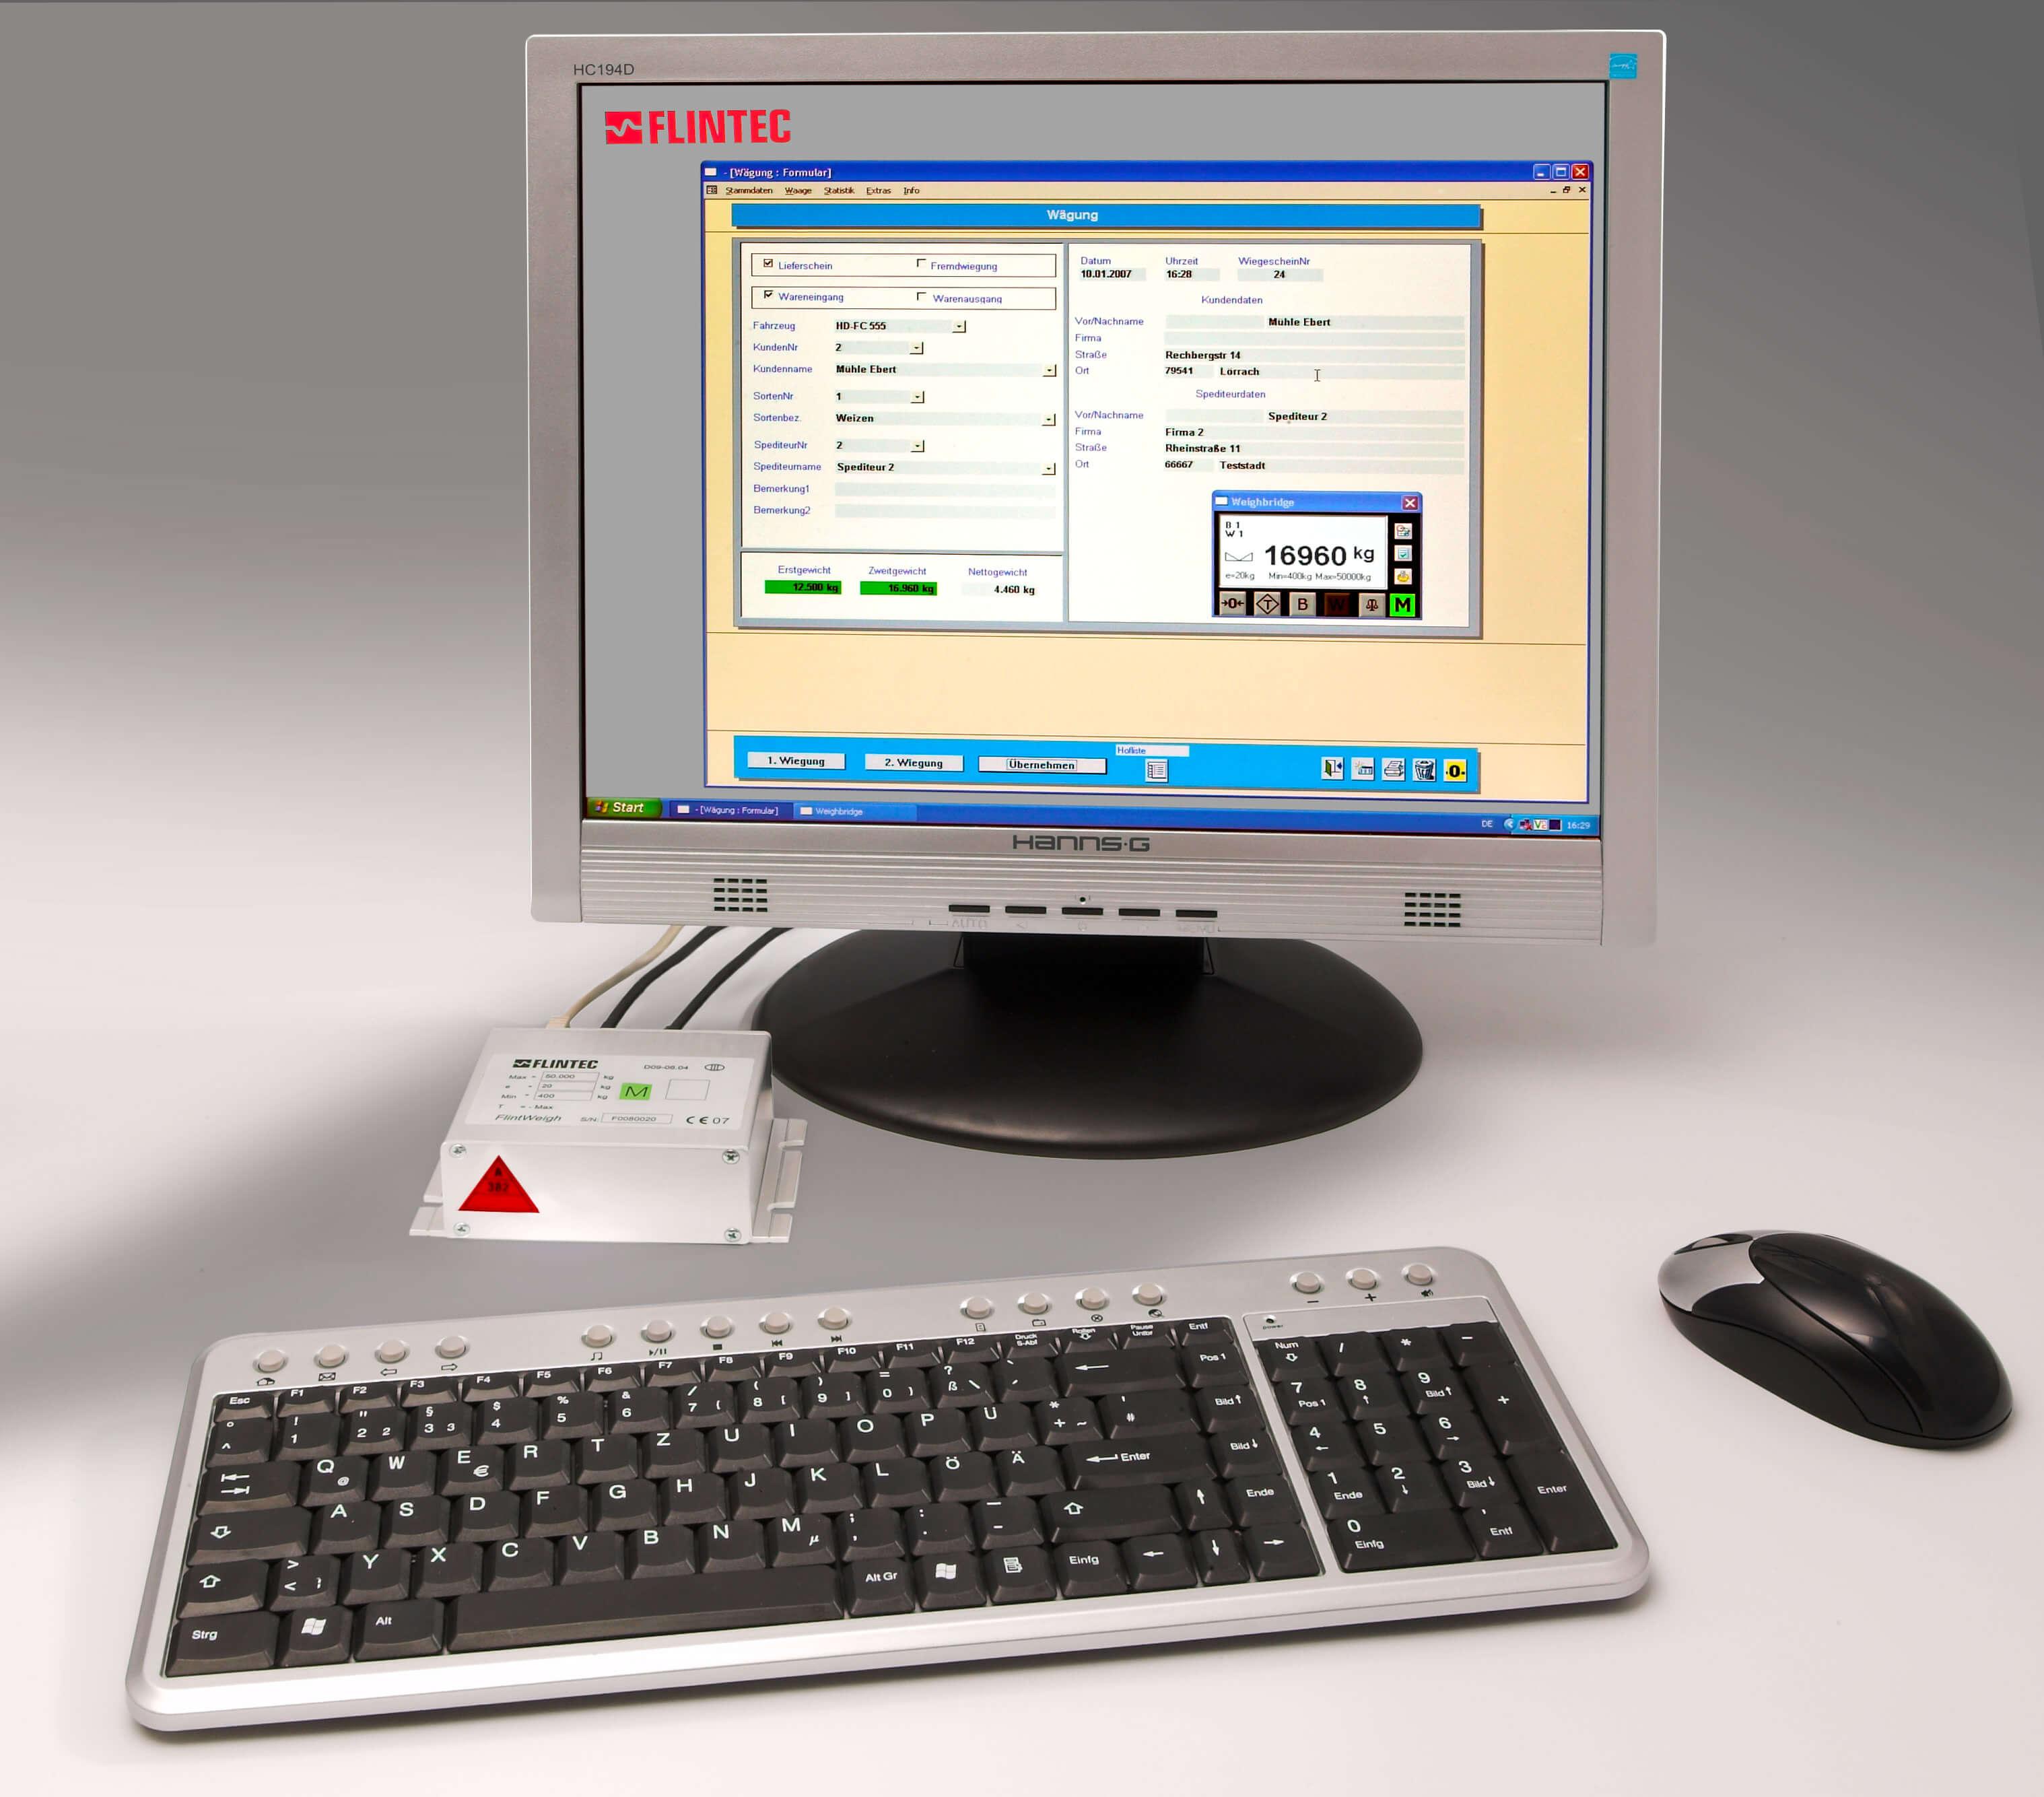 Flintweigh 2 PC weegsysteem Image